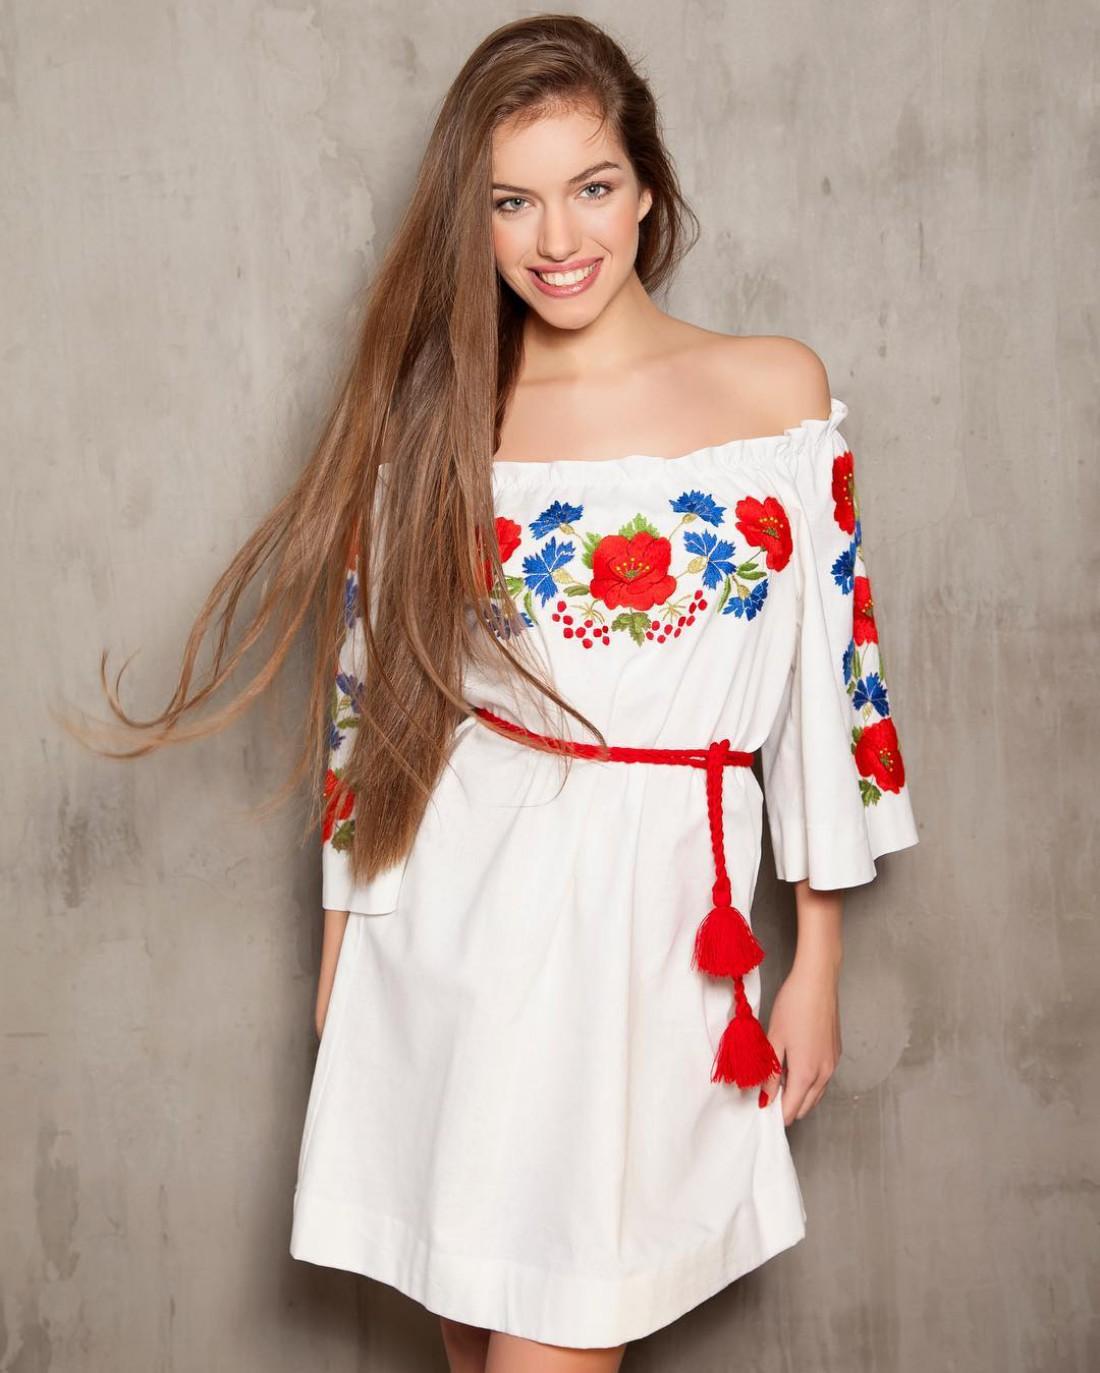 Мисс Украина 2016 - Александра Кучеренко